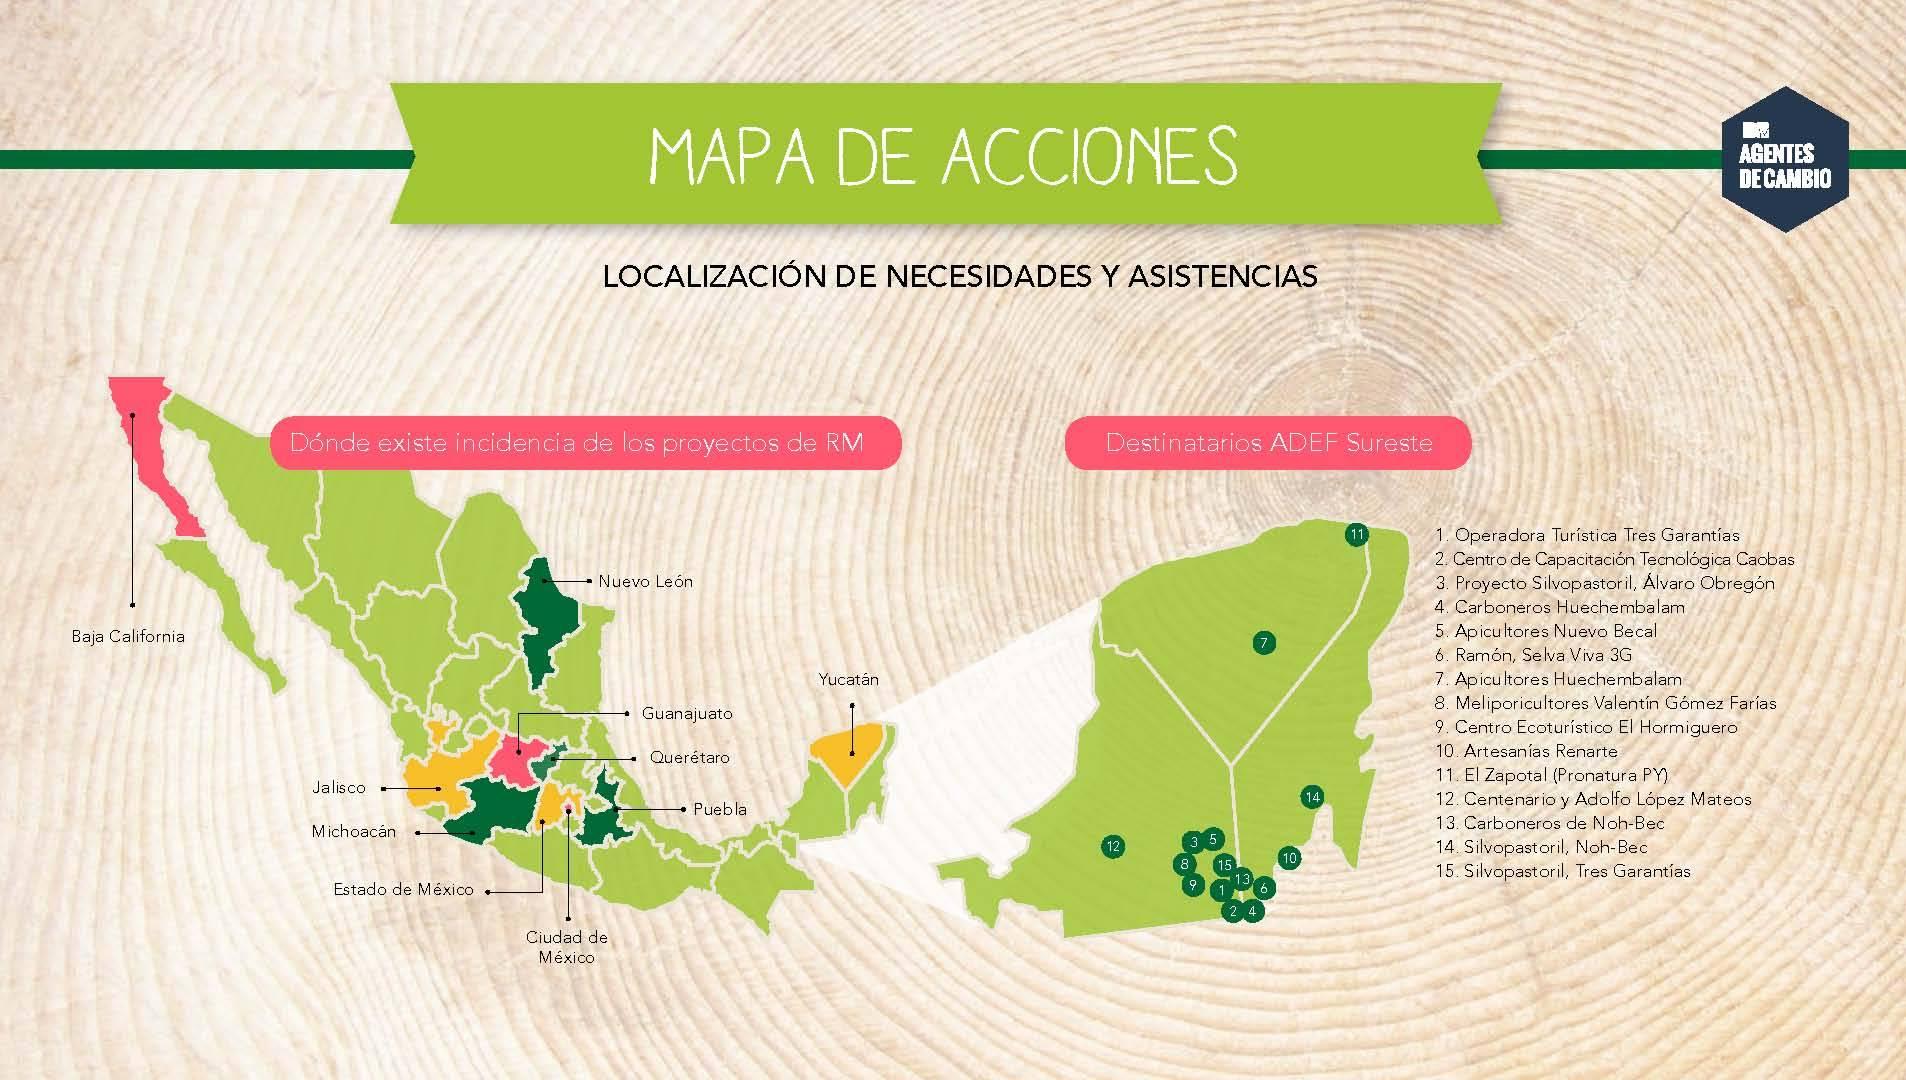 mgid:file:gsp:scenic:/international/mtvla.com-new/articulos/2016/abril/26/reforestamos_mexico_1_Page_09.jpg